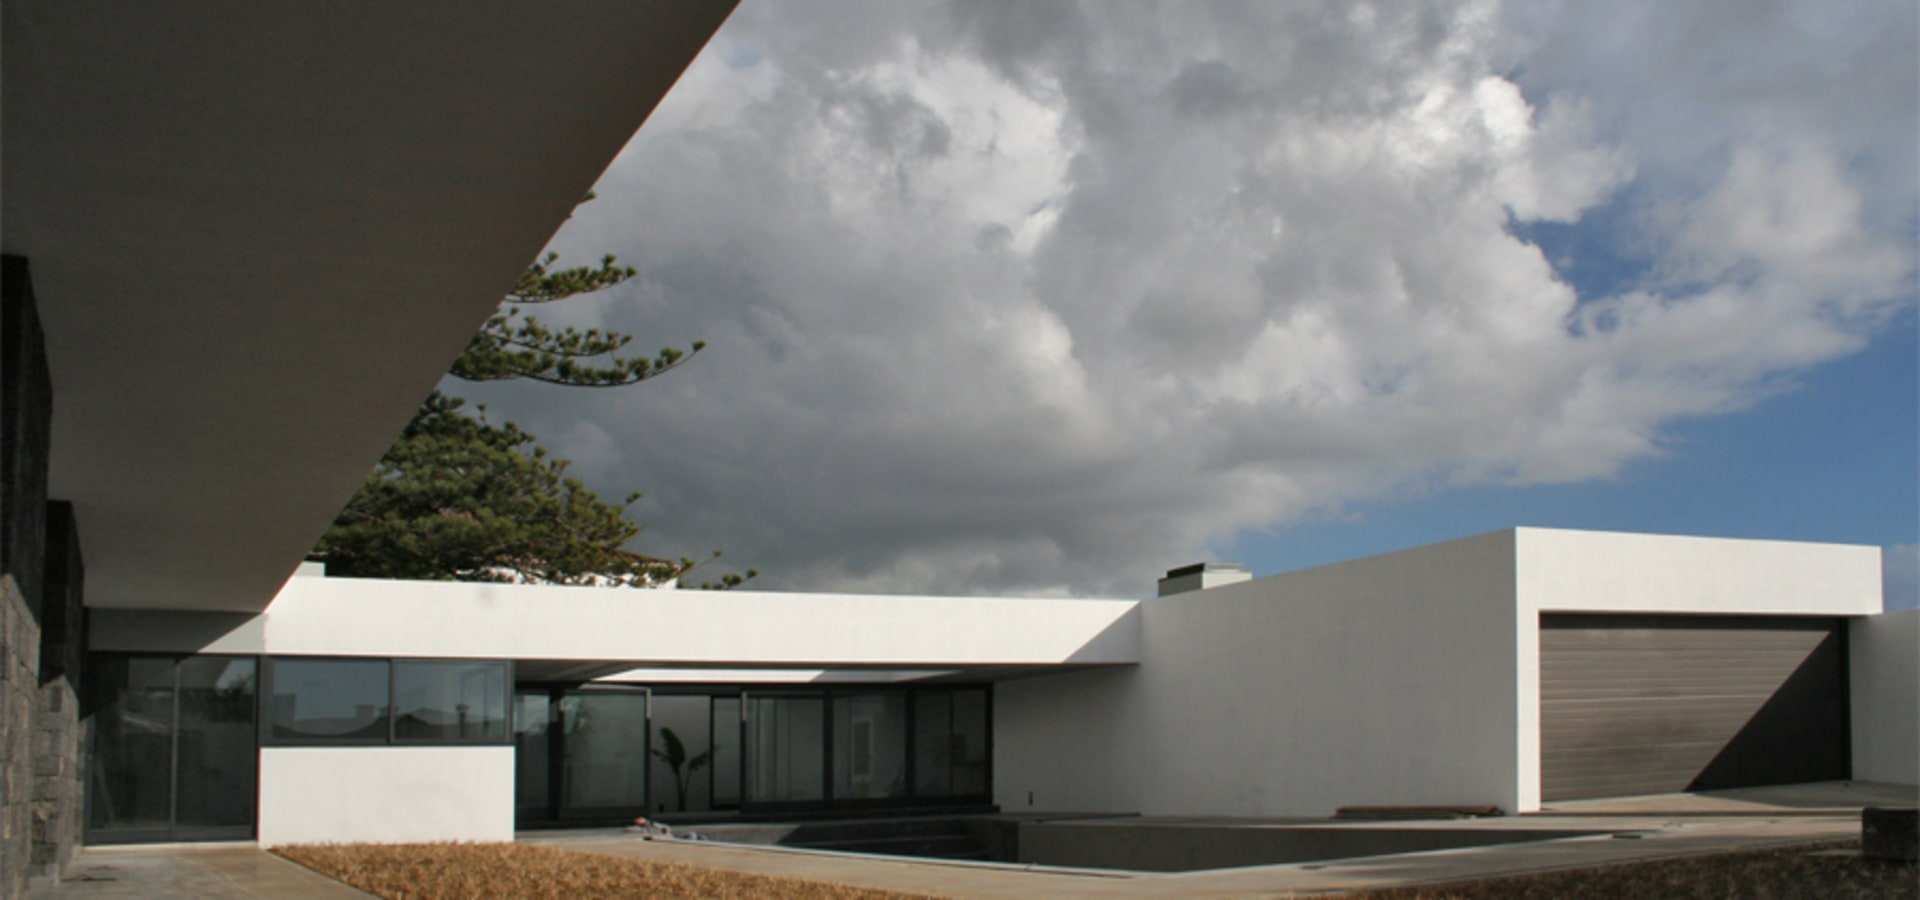 Pedro Mosca & Pedro Gonçalves, Arquitectos, Lda